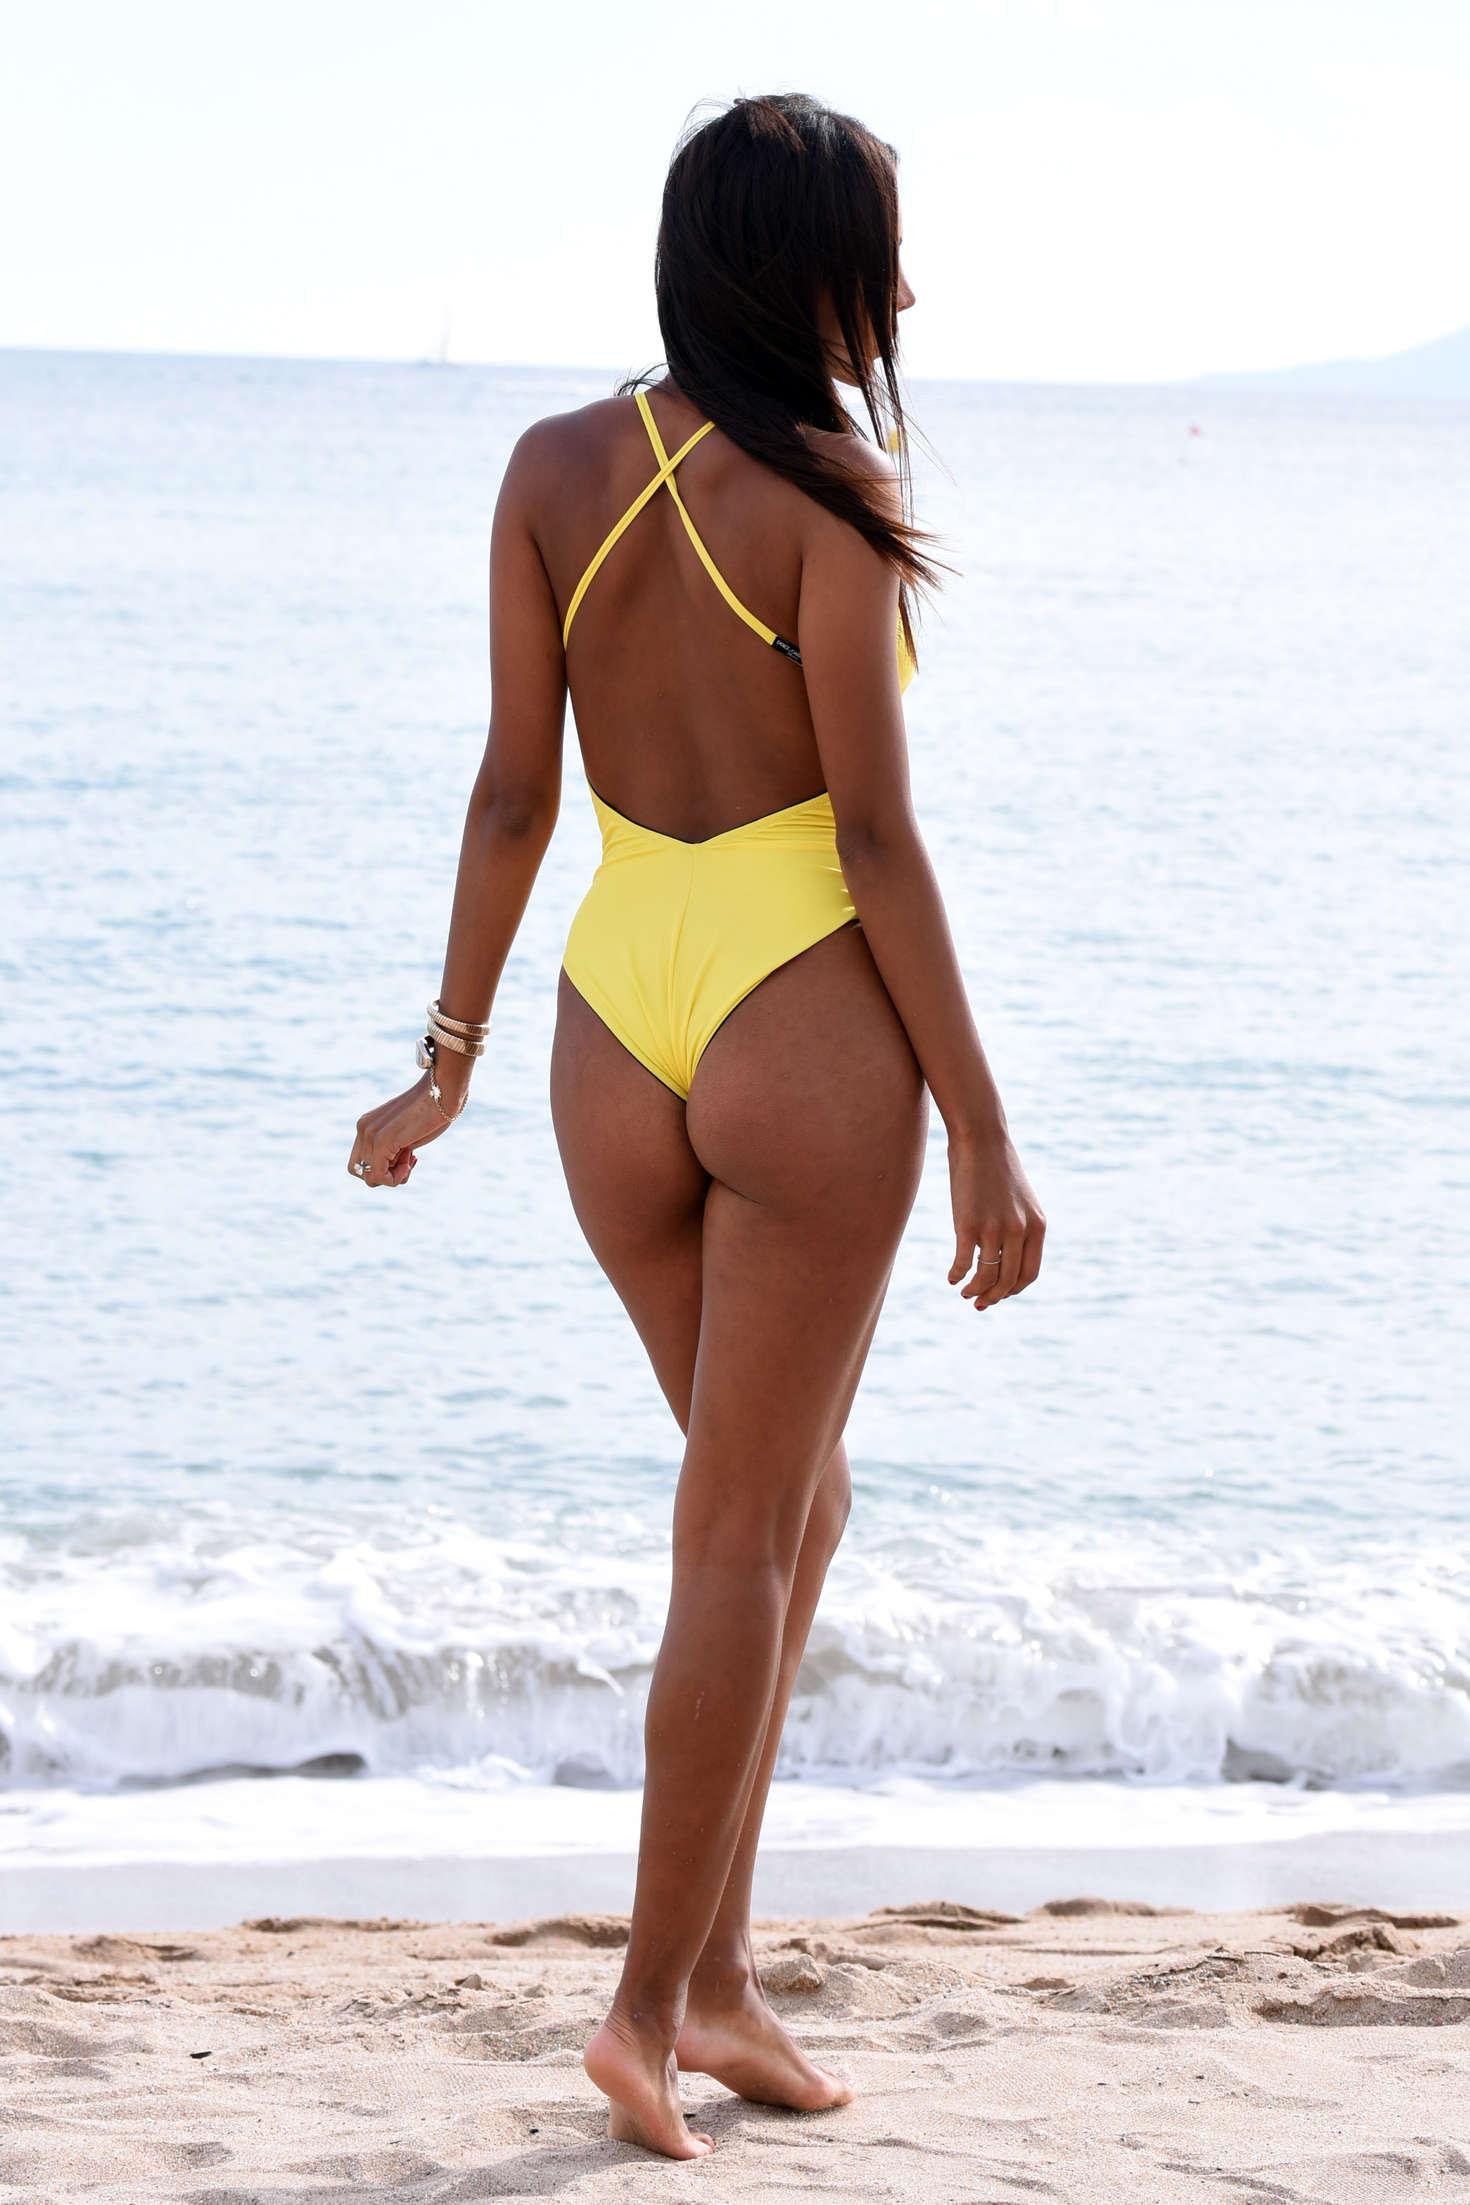 Photos Patricia Gloria Contreras nude (74 photo), Sexy, Sideboobs, Selfie, in bikini 2020